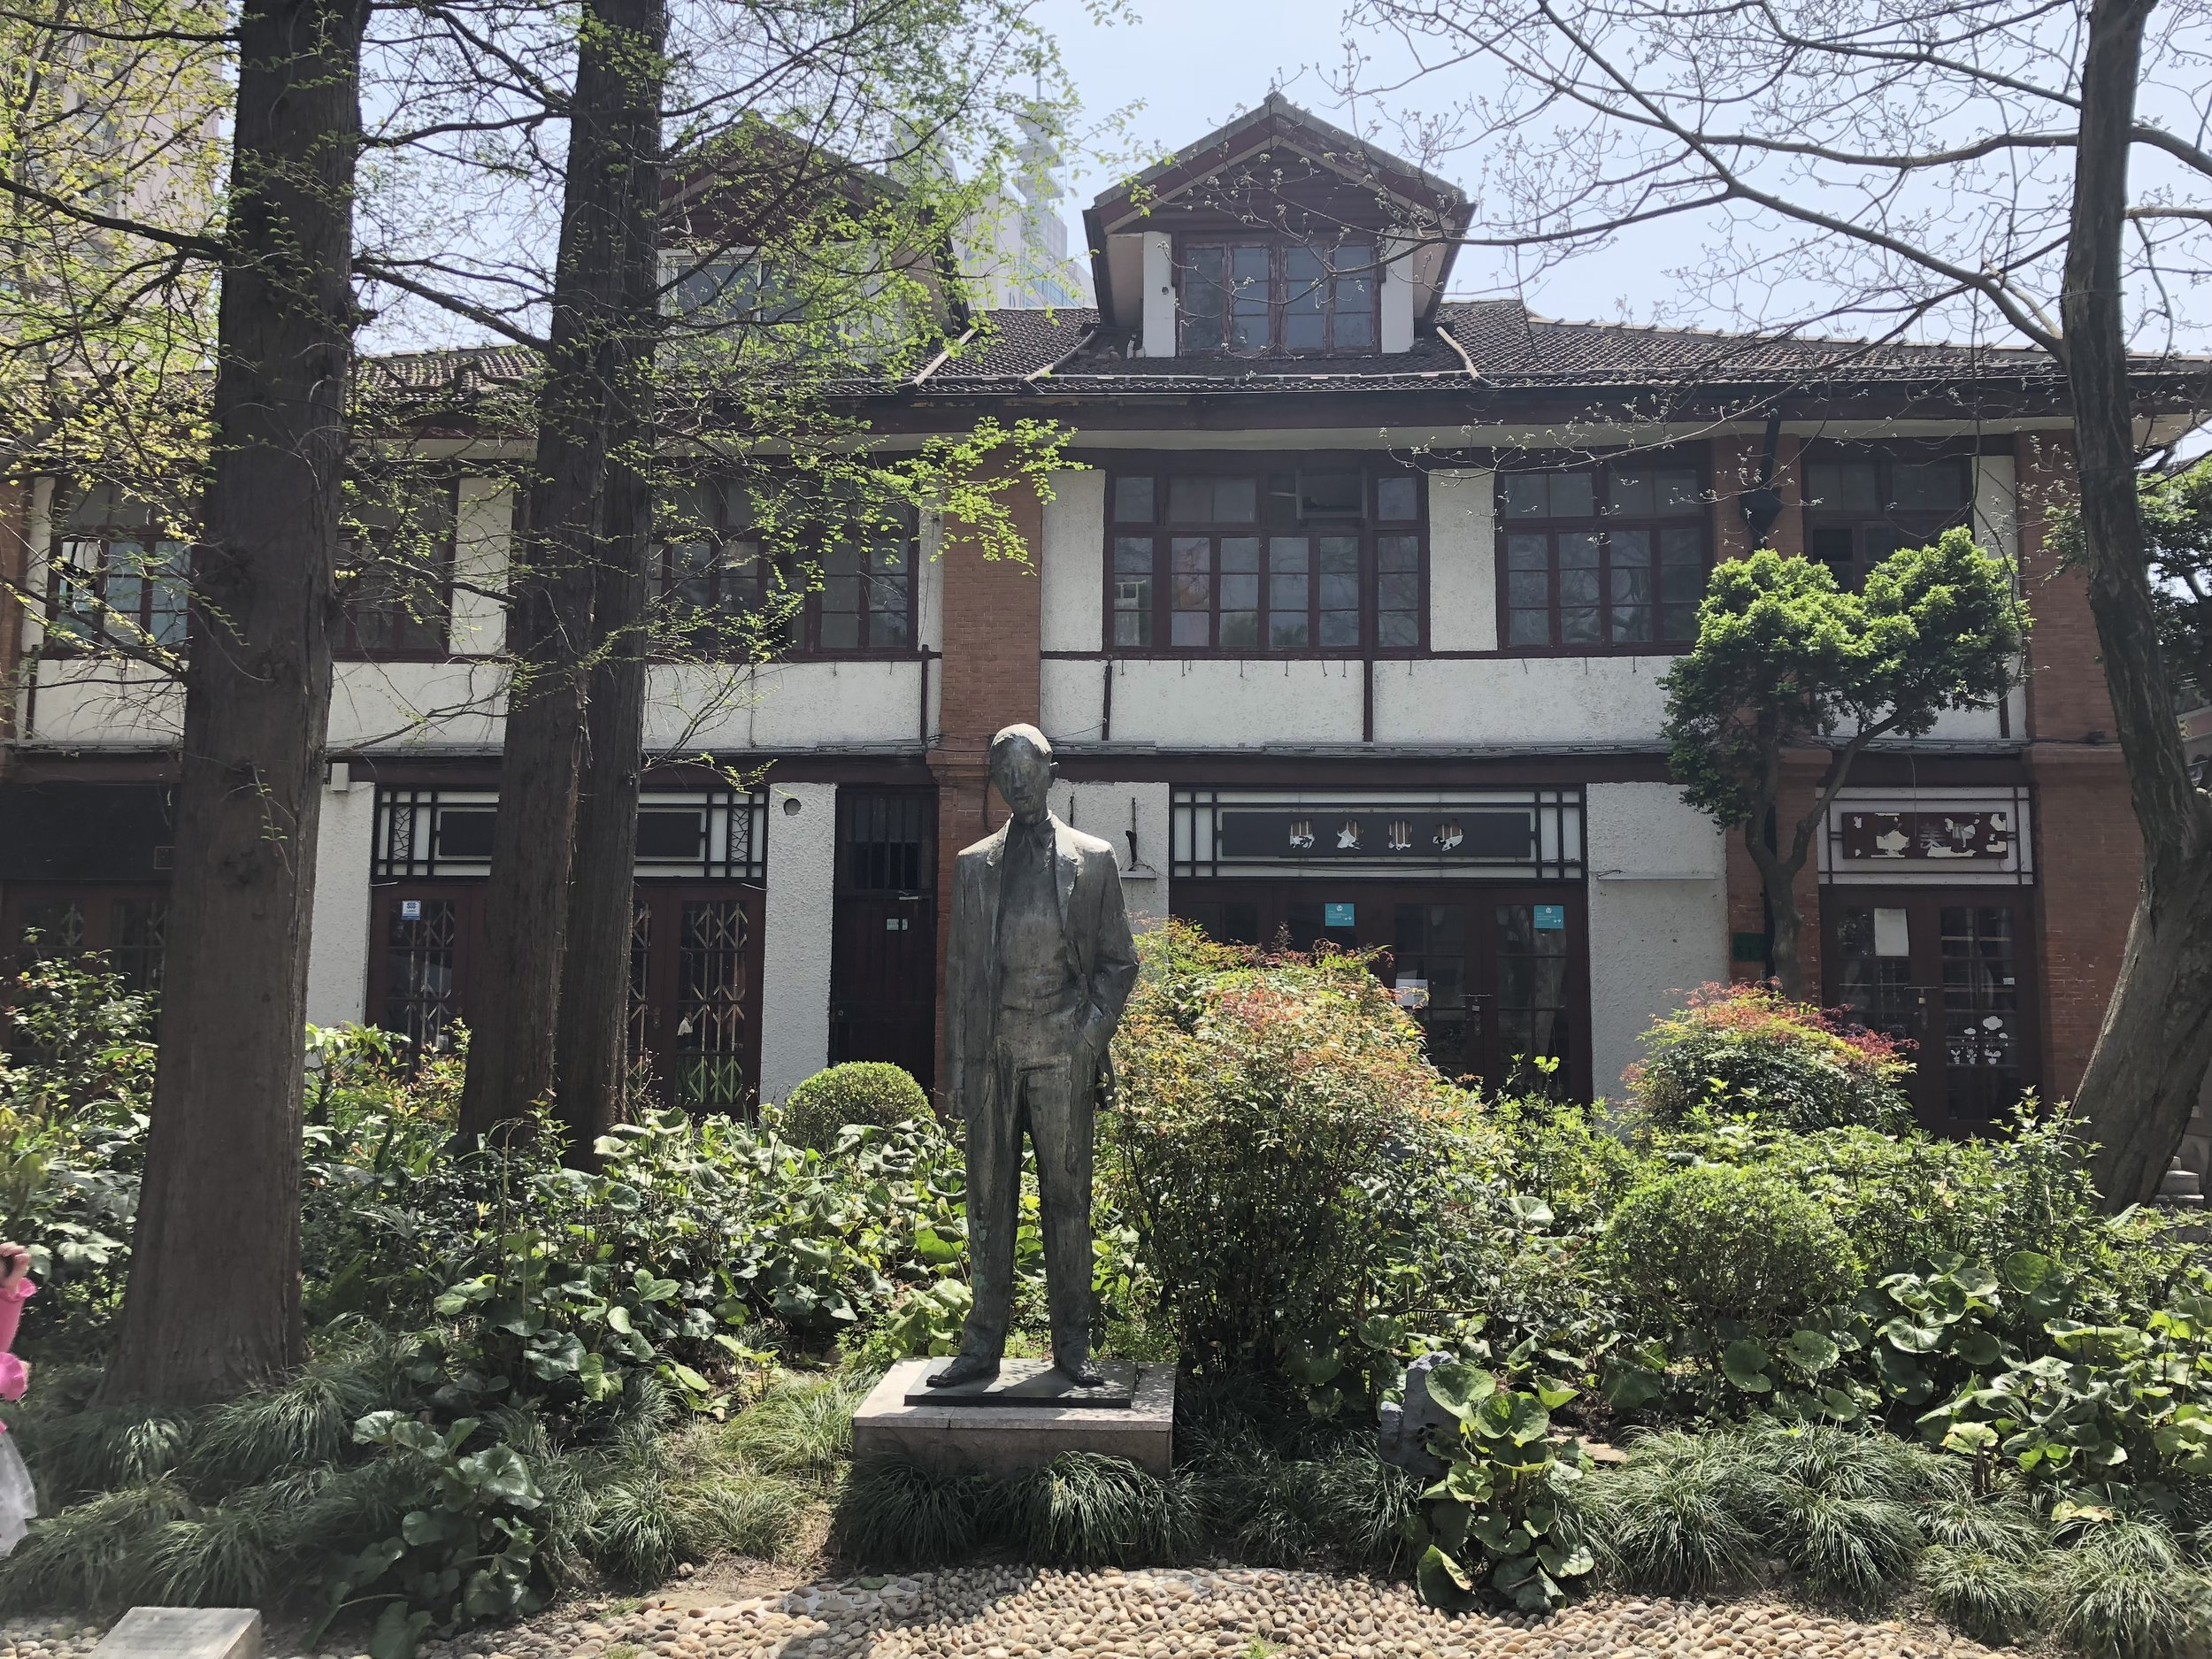 A statue on Duolun Road honoring the literary figure Mao Dun 矛盾